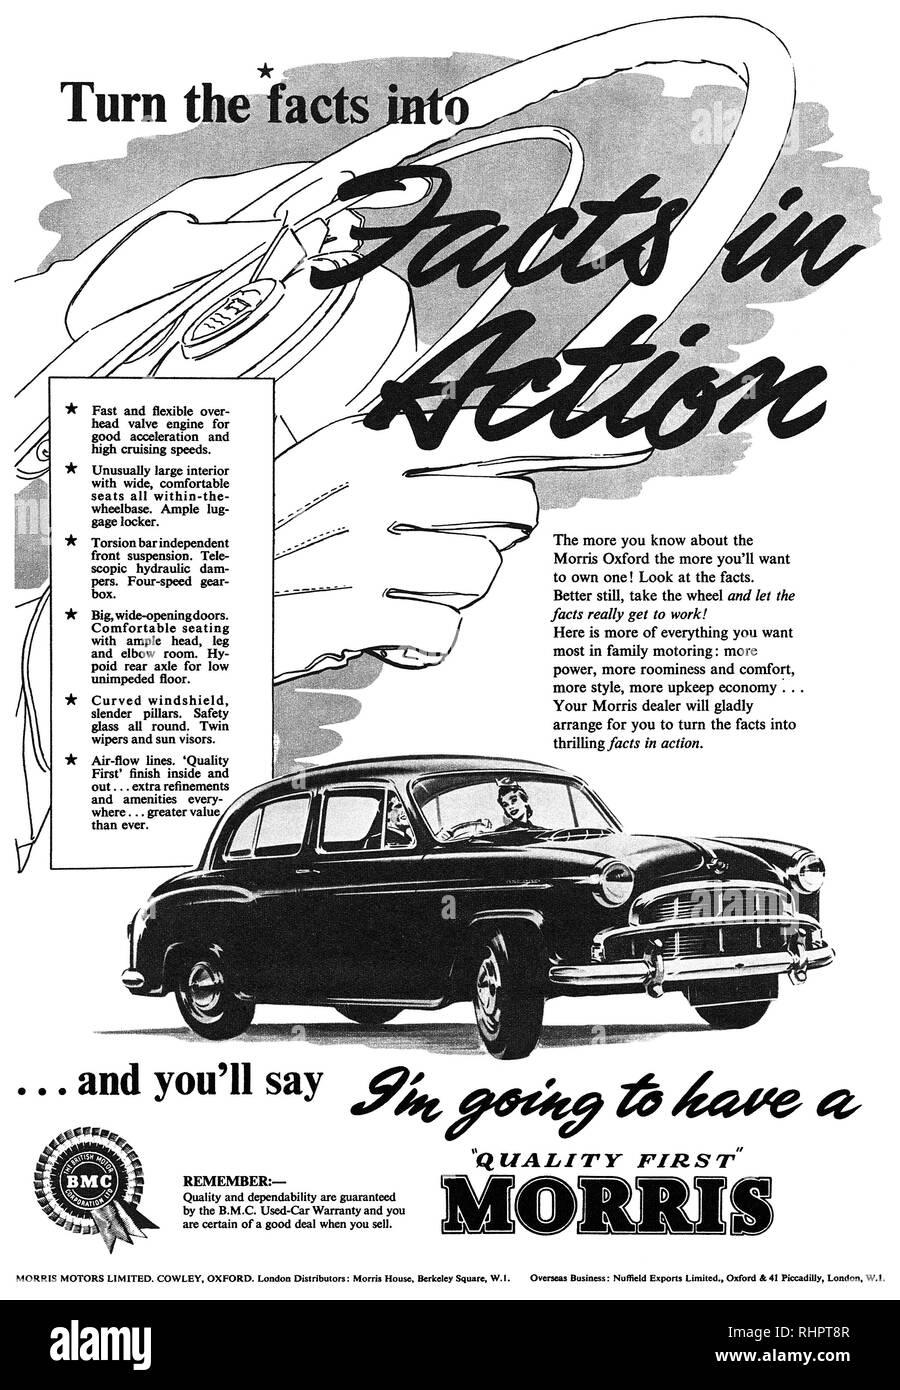 1950s car advertisement stock